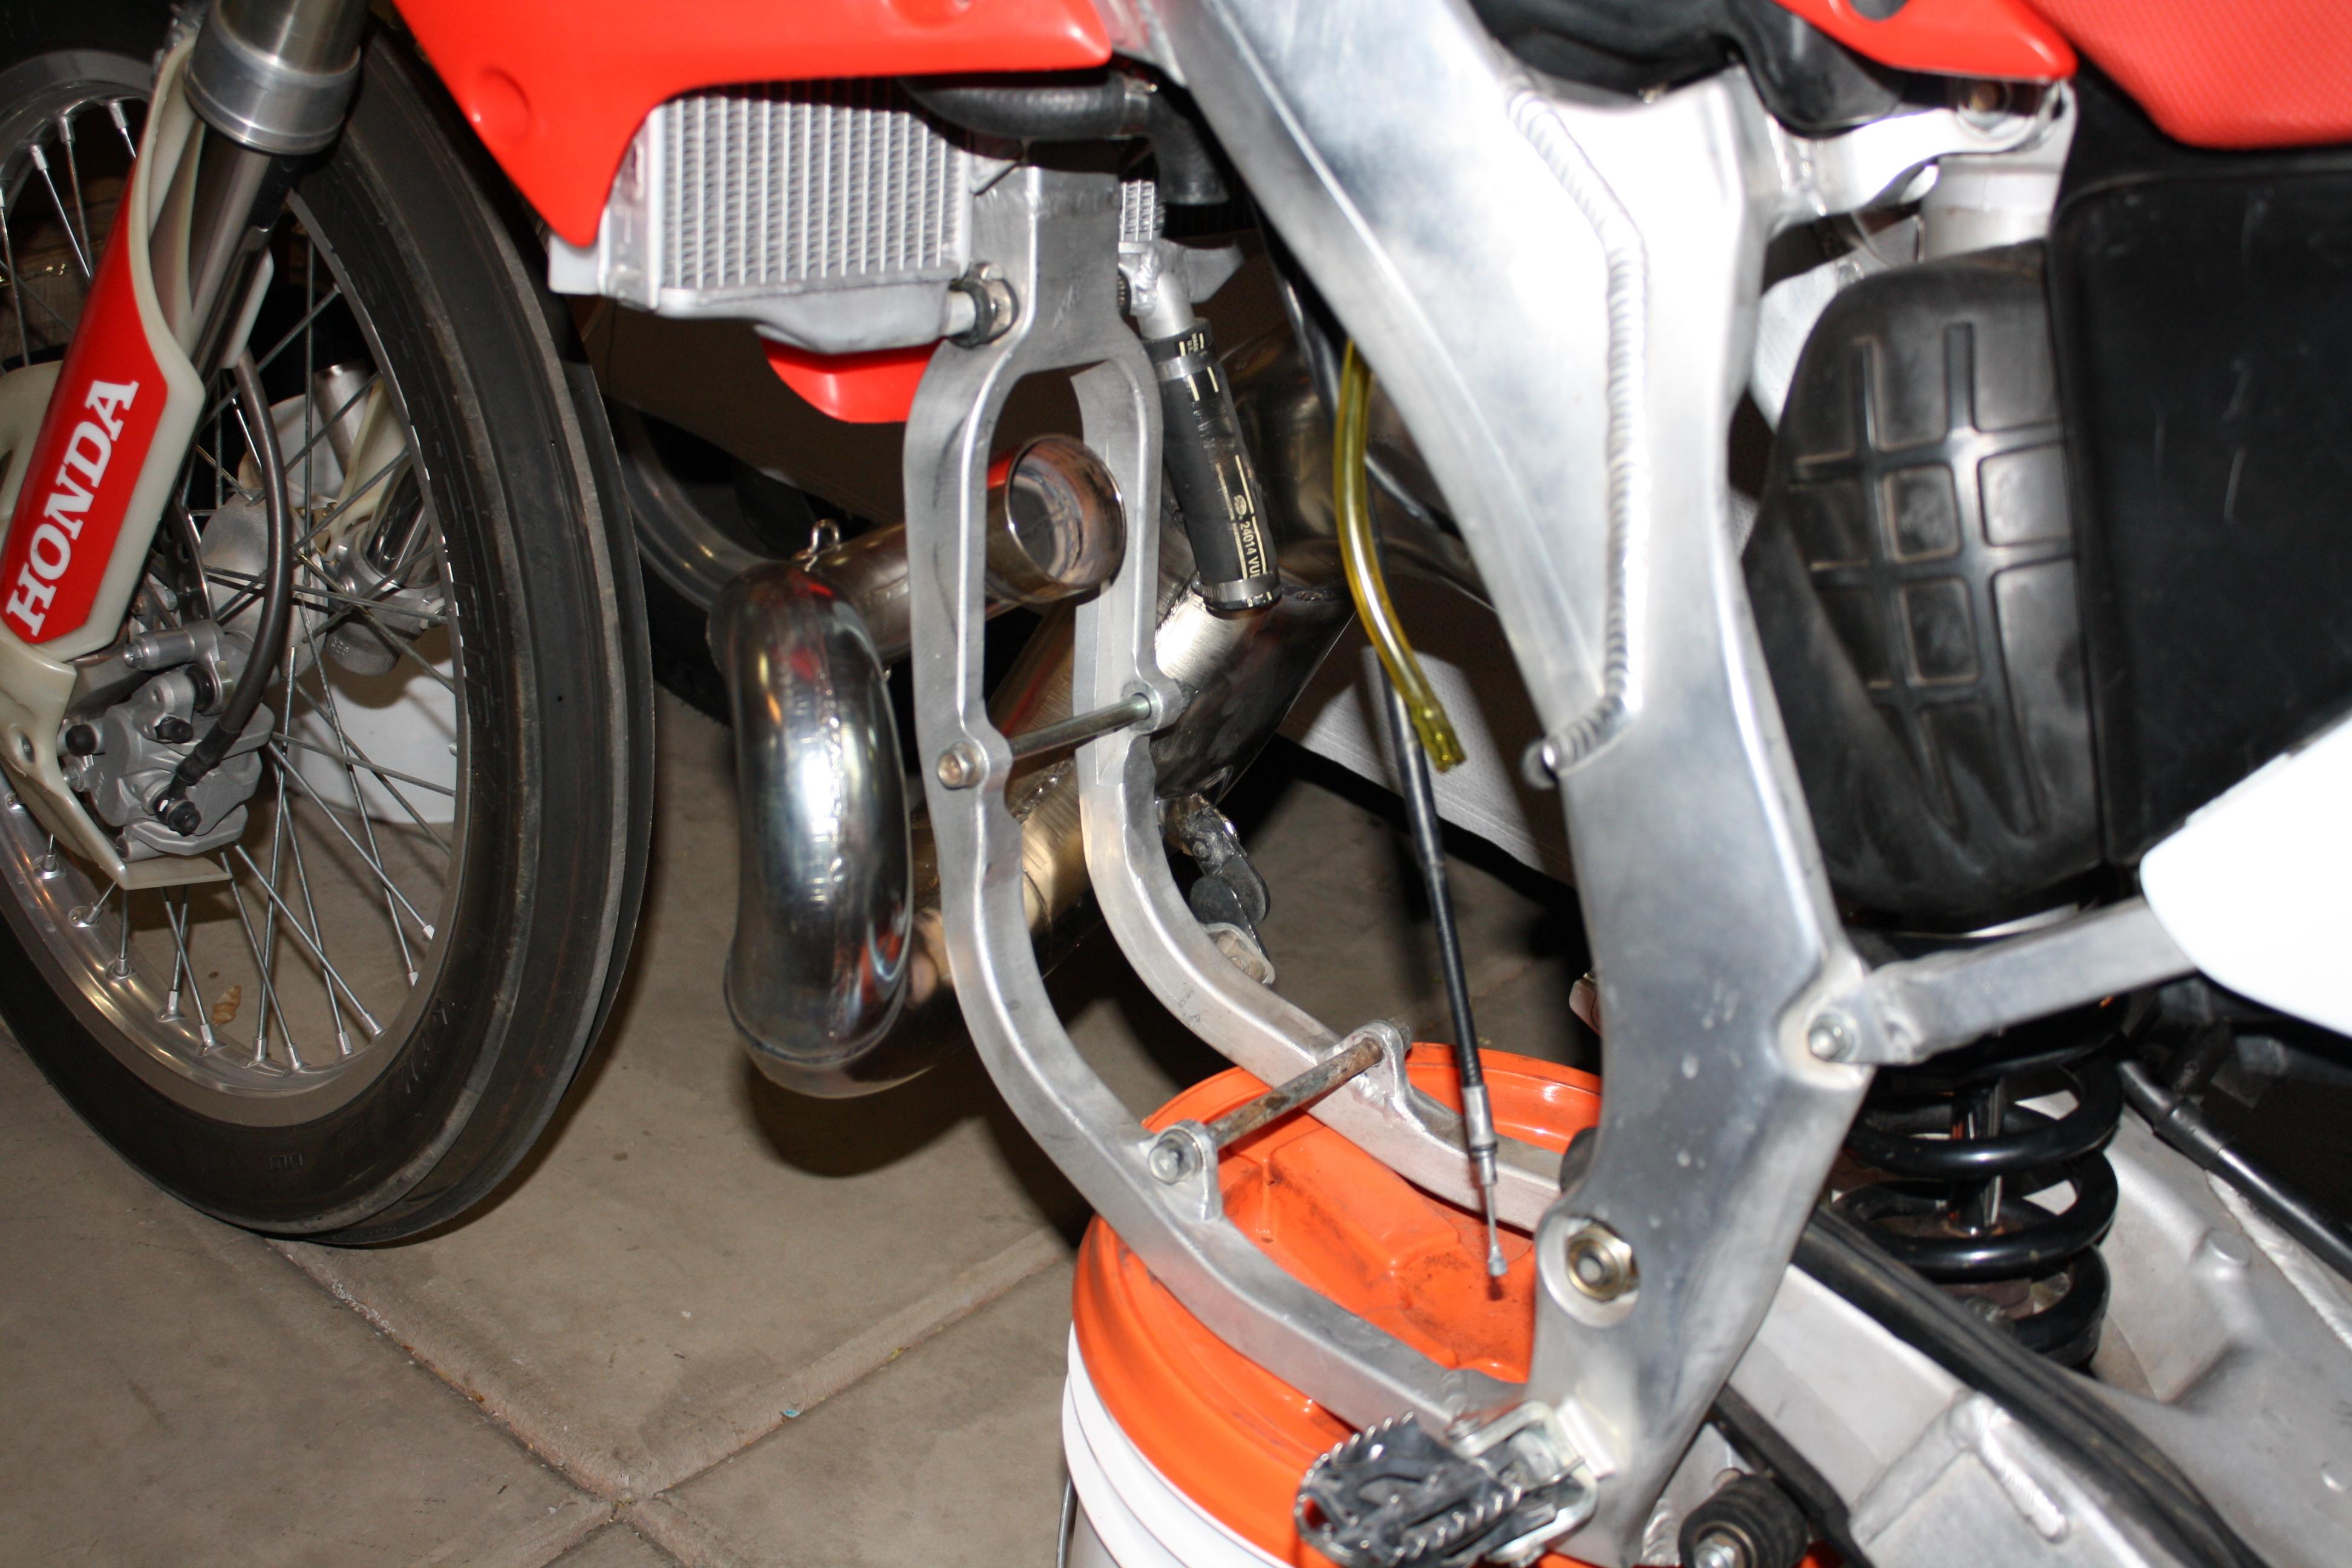 Cr 500 Wiring Diagram Electrical Diagrams Honda Cr125r Engine Cr500 Harness Product U2022 Snatch Block